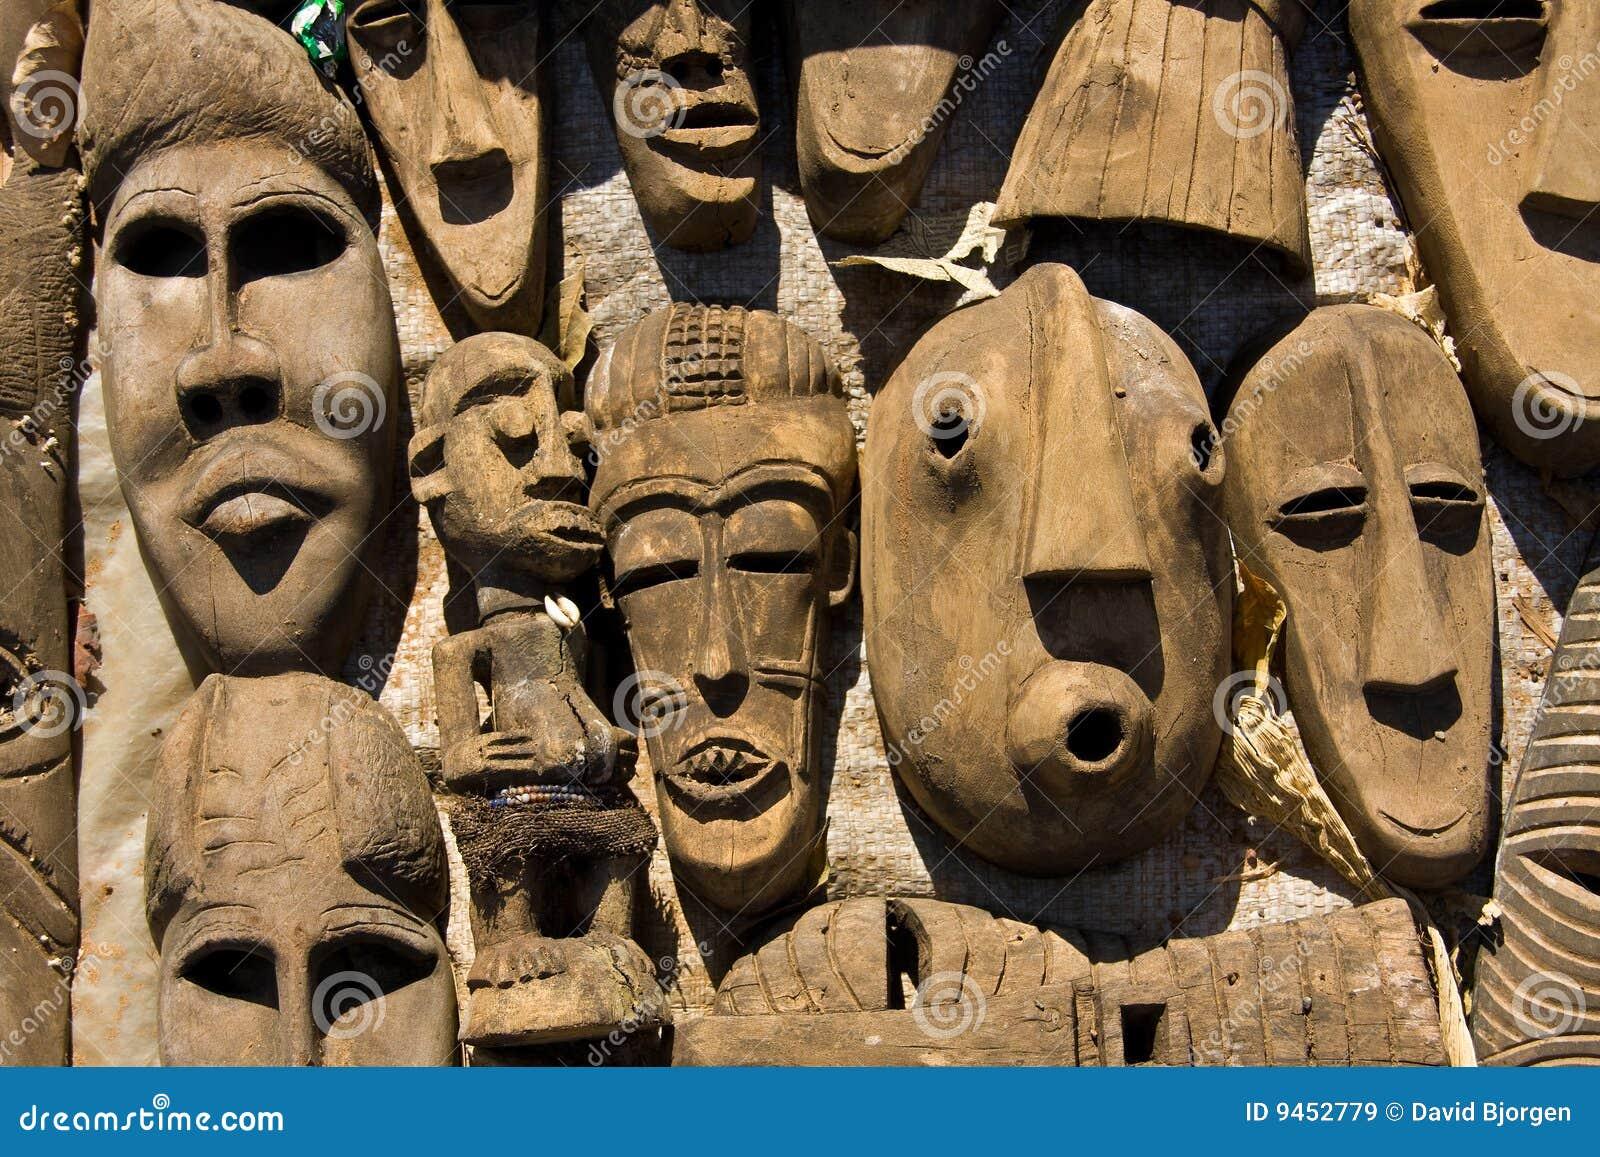 Voodoo amulet royalty free stock photos image 2718528 - African Masks Royalty Free Stock Images